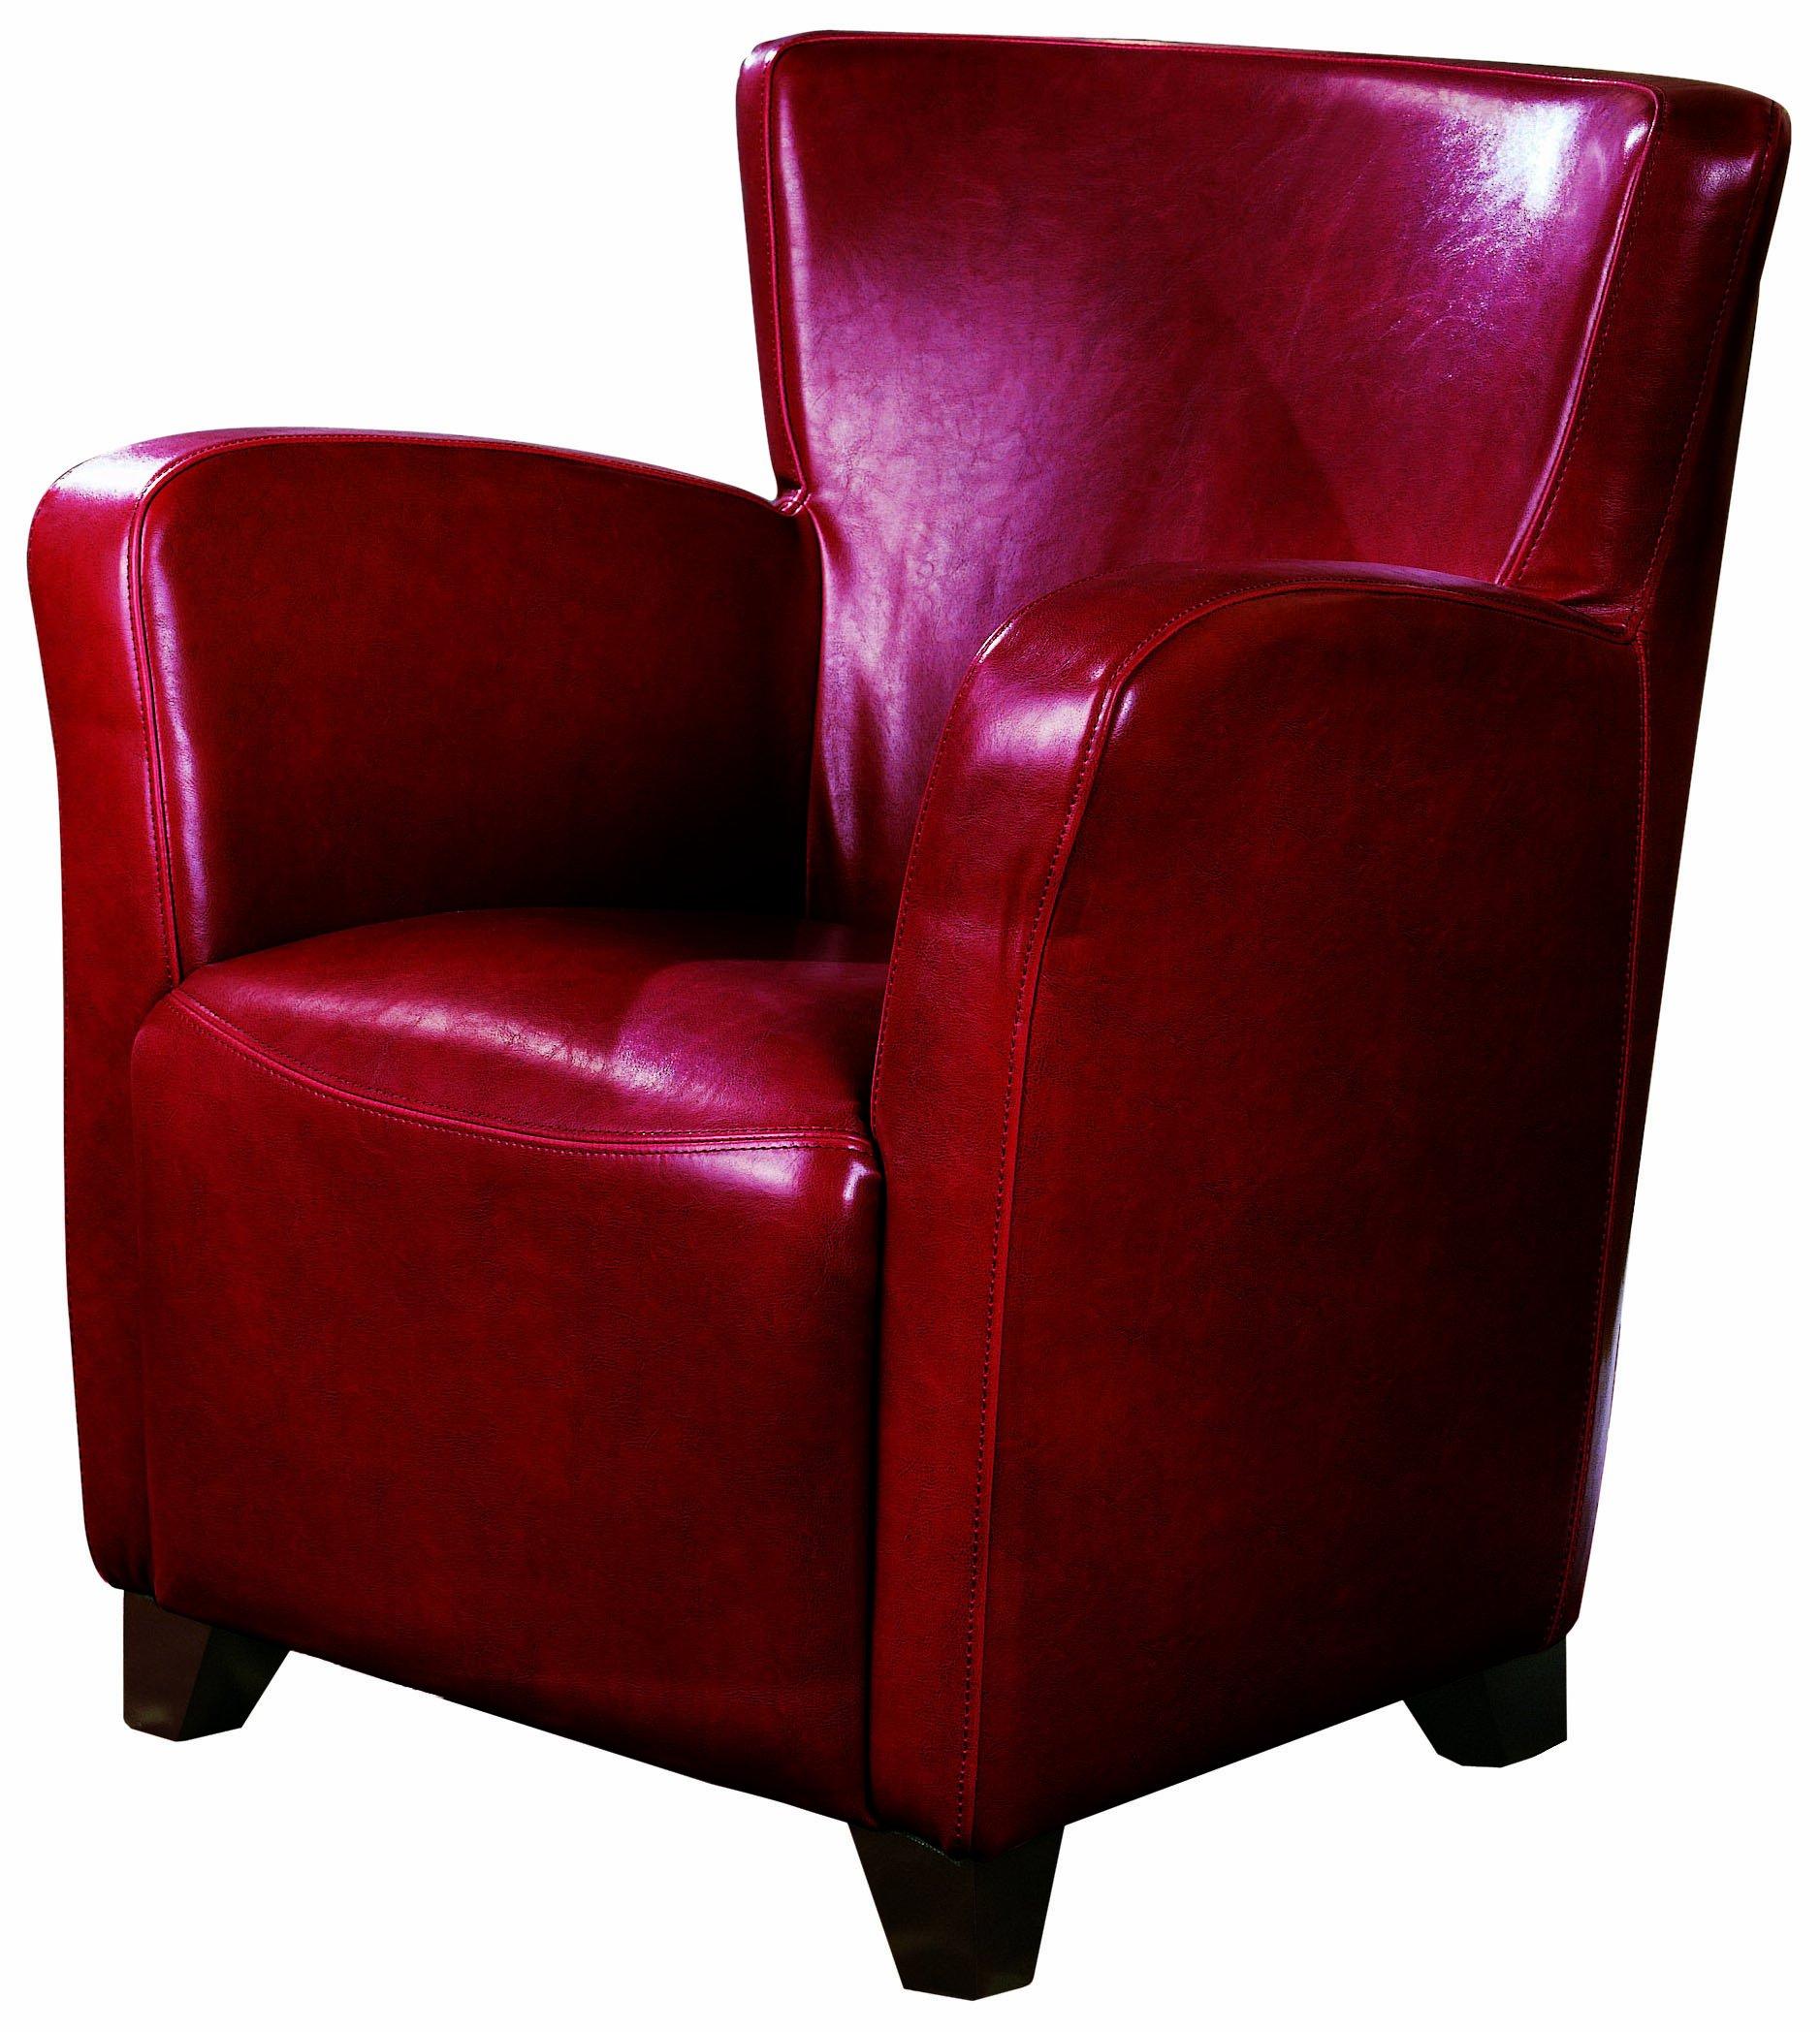 Coaster Accent Chair Red Burgundy Polyurethane FurnitureNdecor